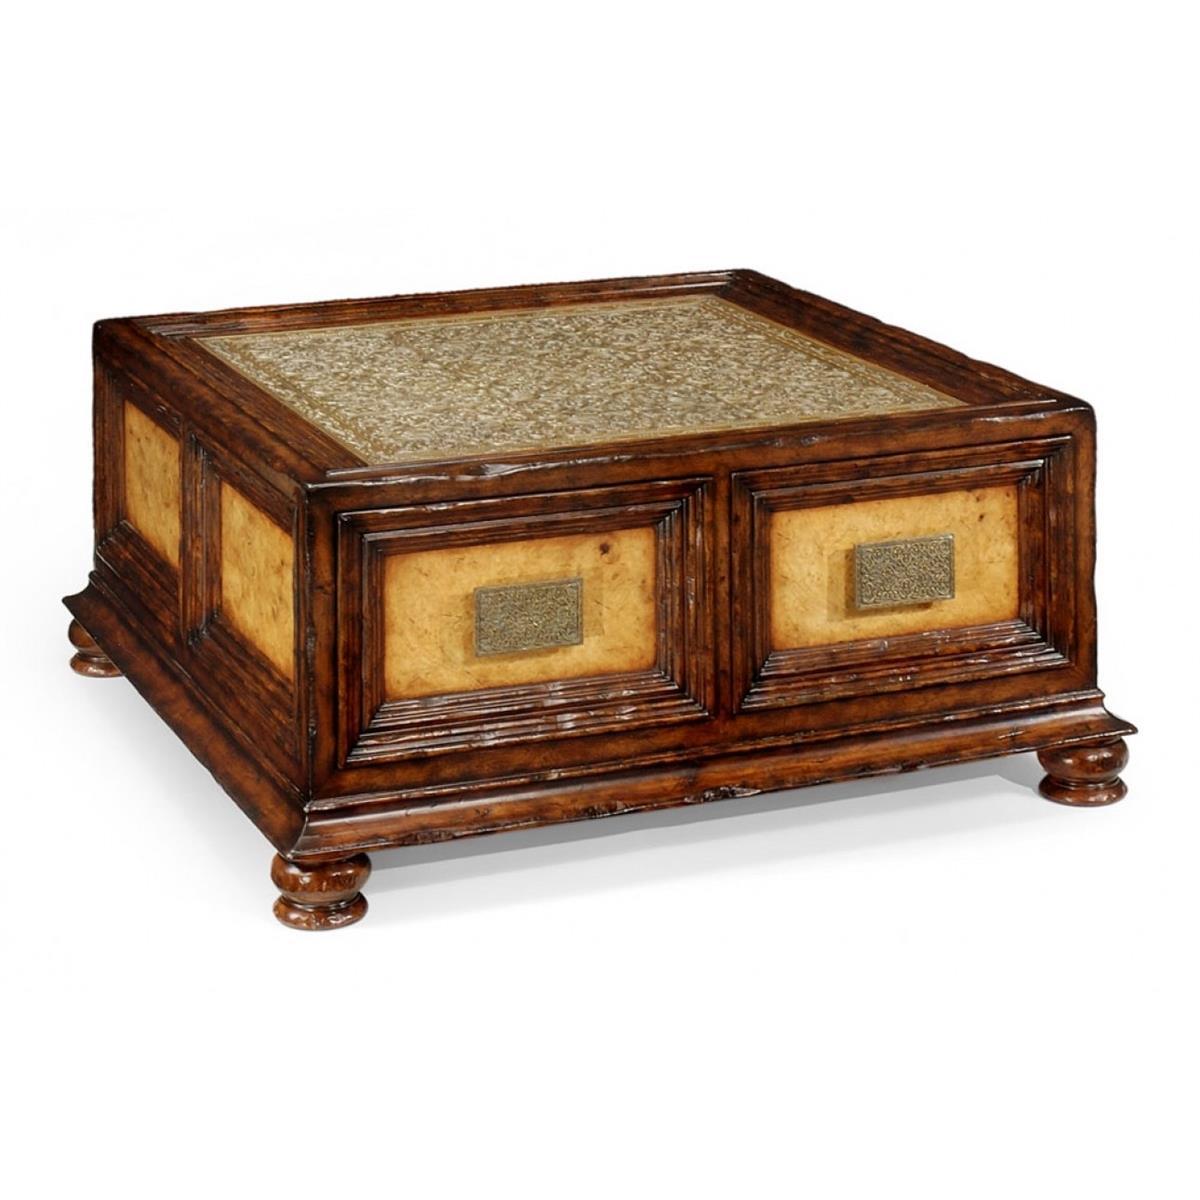 492629 Walnut & Brass Square Coffee Table with Drawers - на 360.ru: цены, описание, характеристики, где купить в Москве.